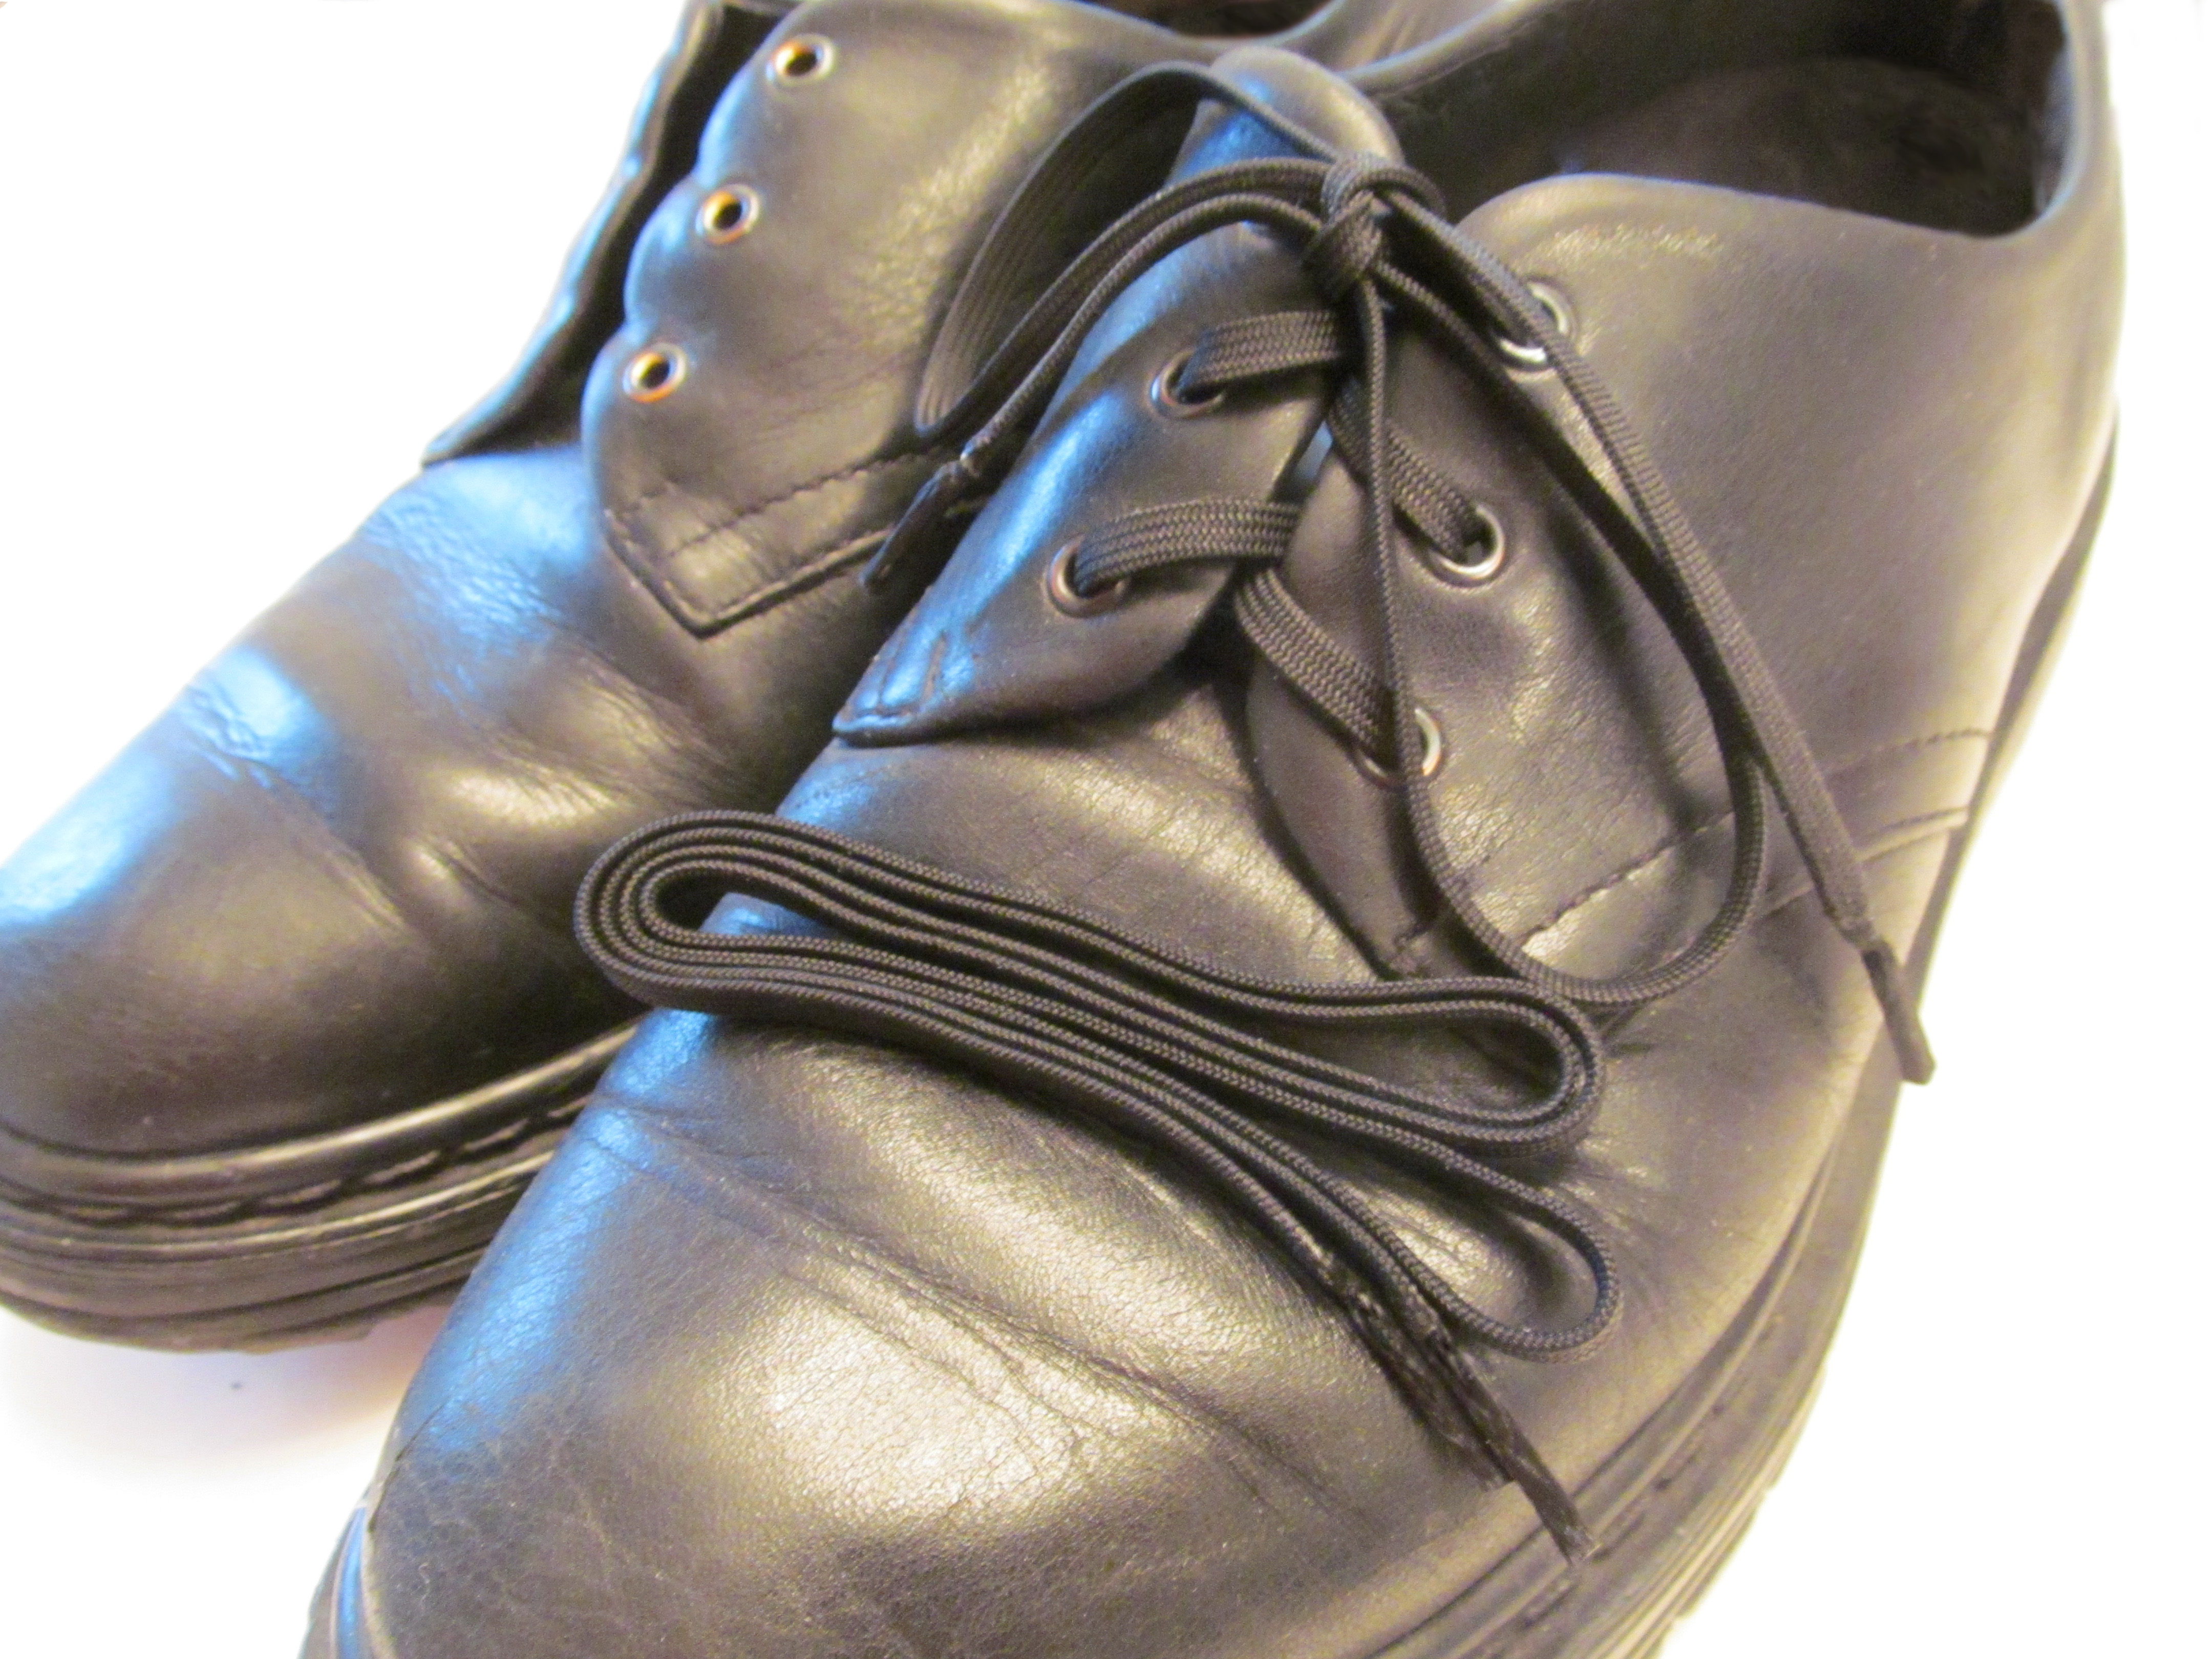 Picture of Paracord Shoe Laces